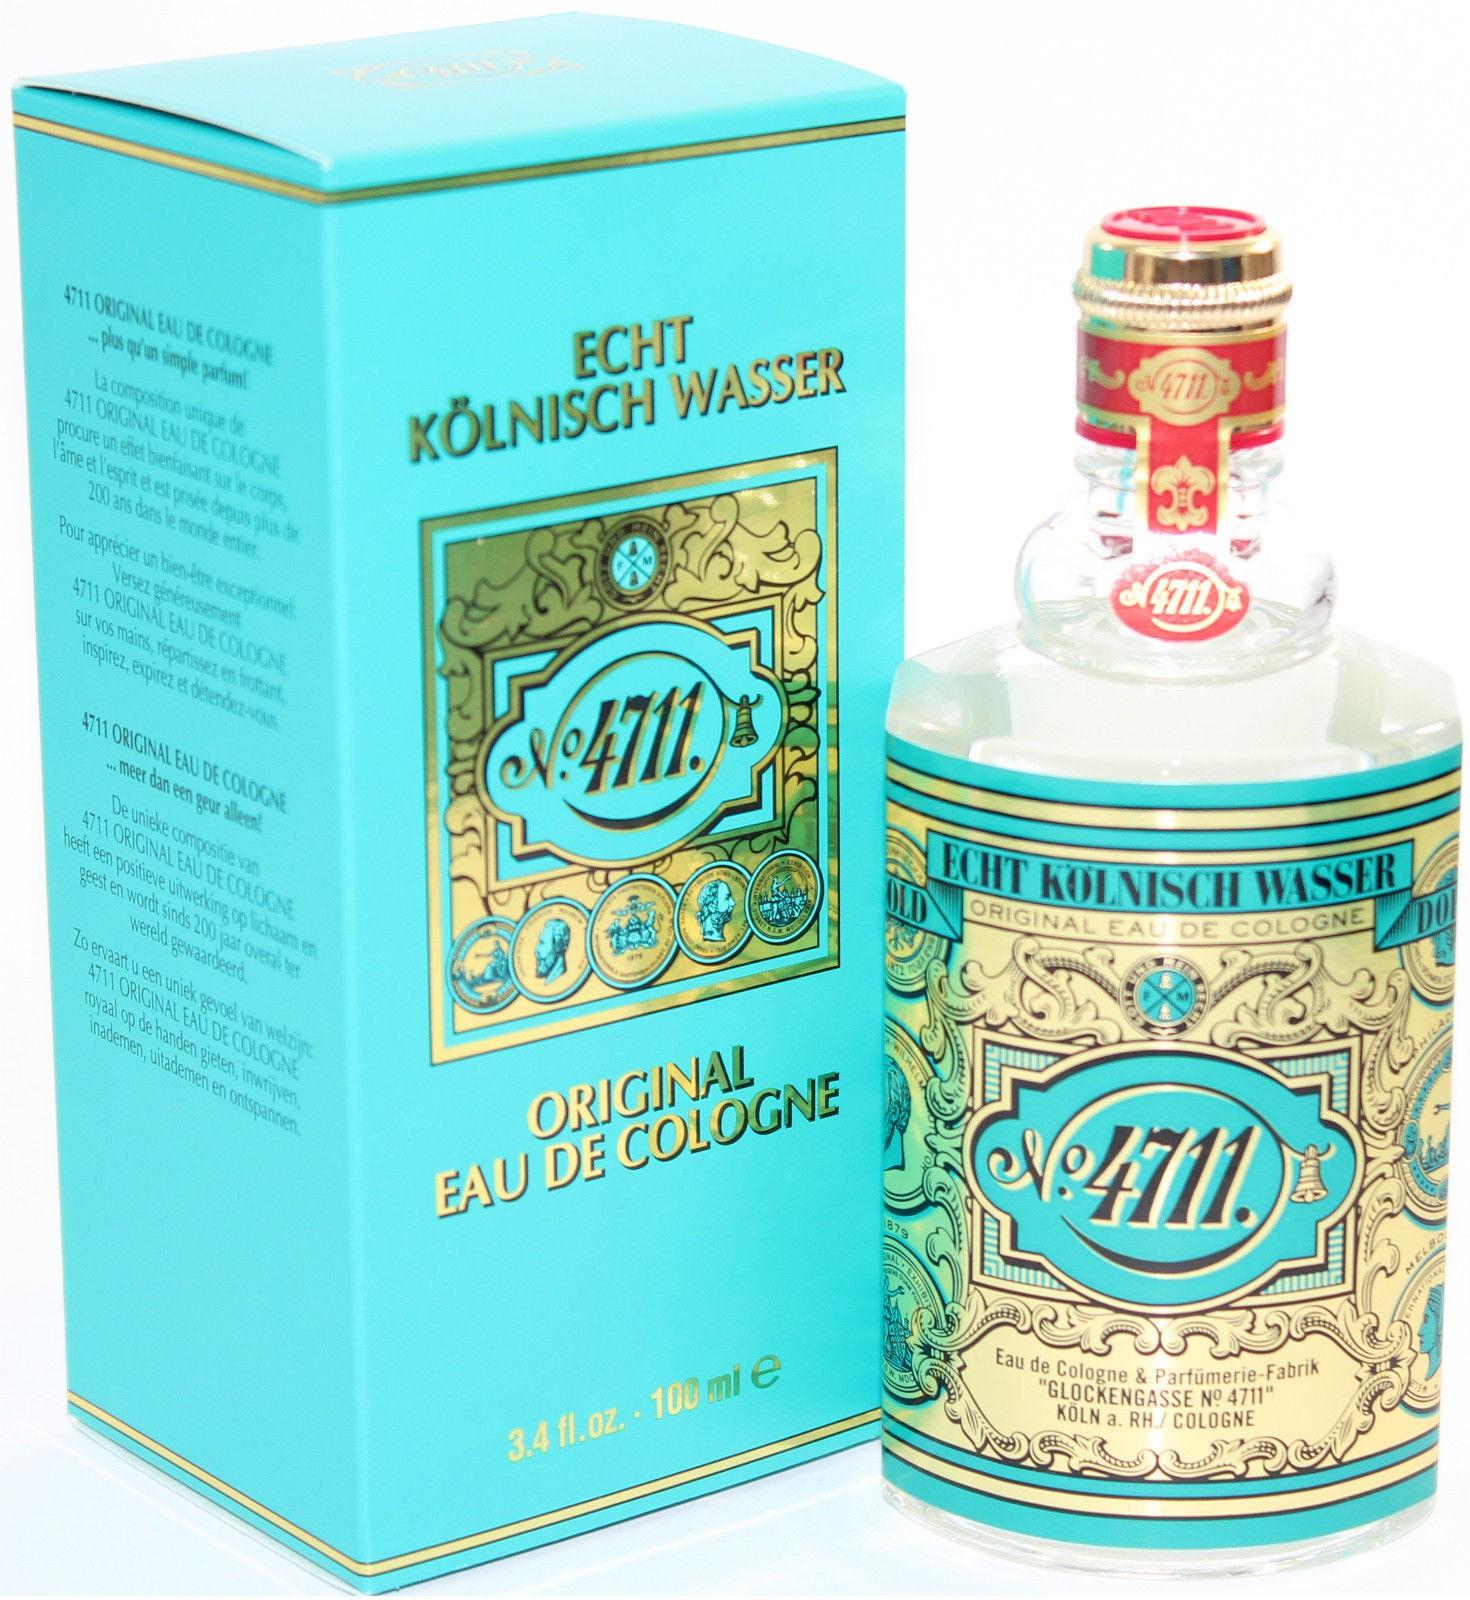 4711 Original Eau de Cologne аромат для мужчин и женщин